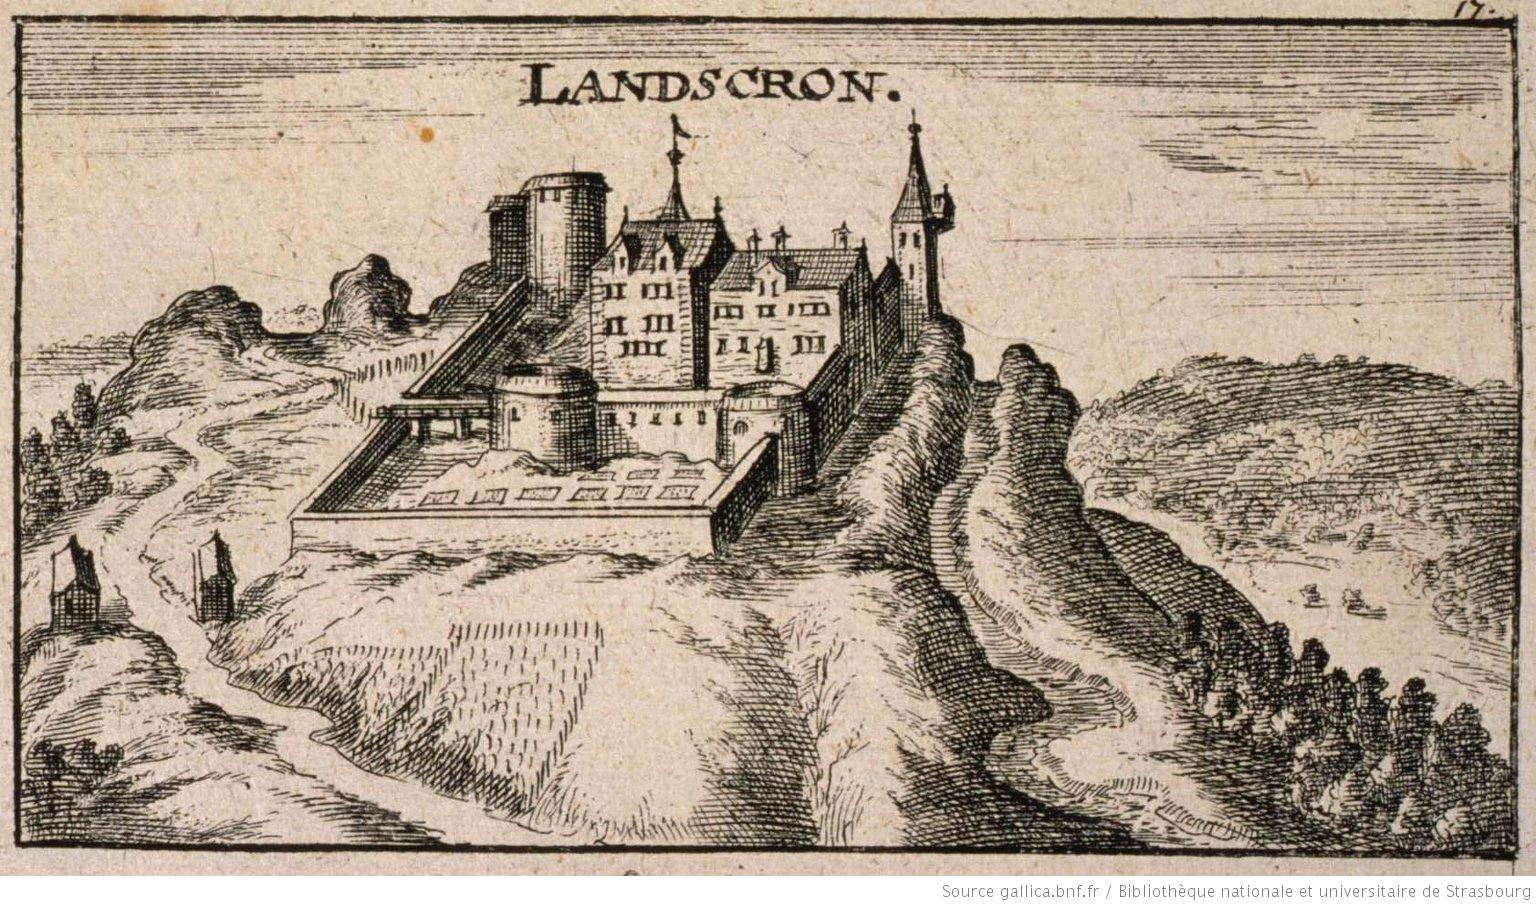 Landskron. Editeur : Ch. Riegel, 1650. Source Gallica.bnf.fr / BNU de Strasbourg, NIM00584